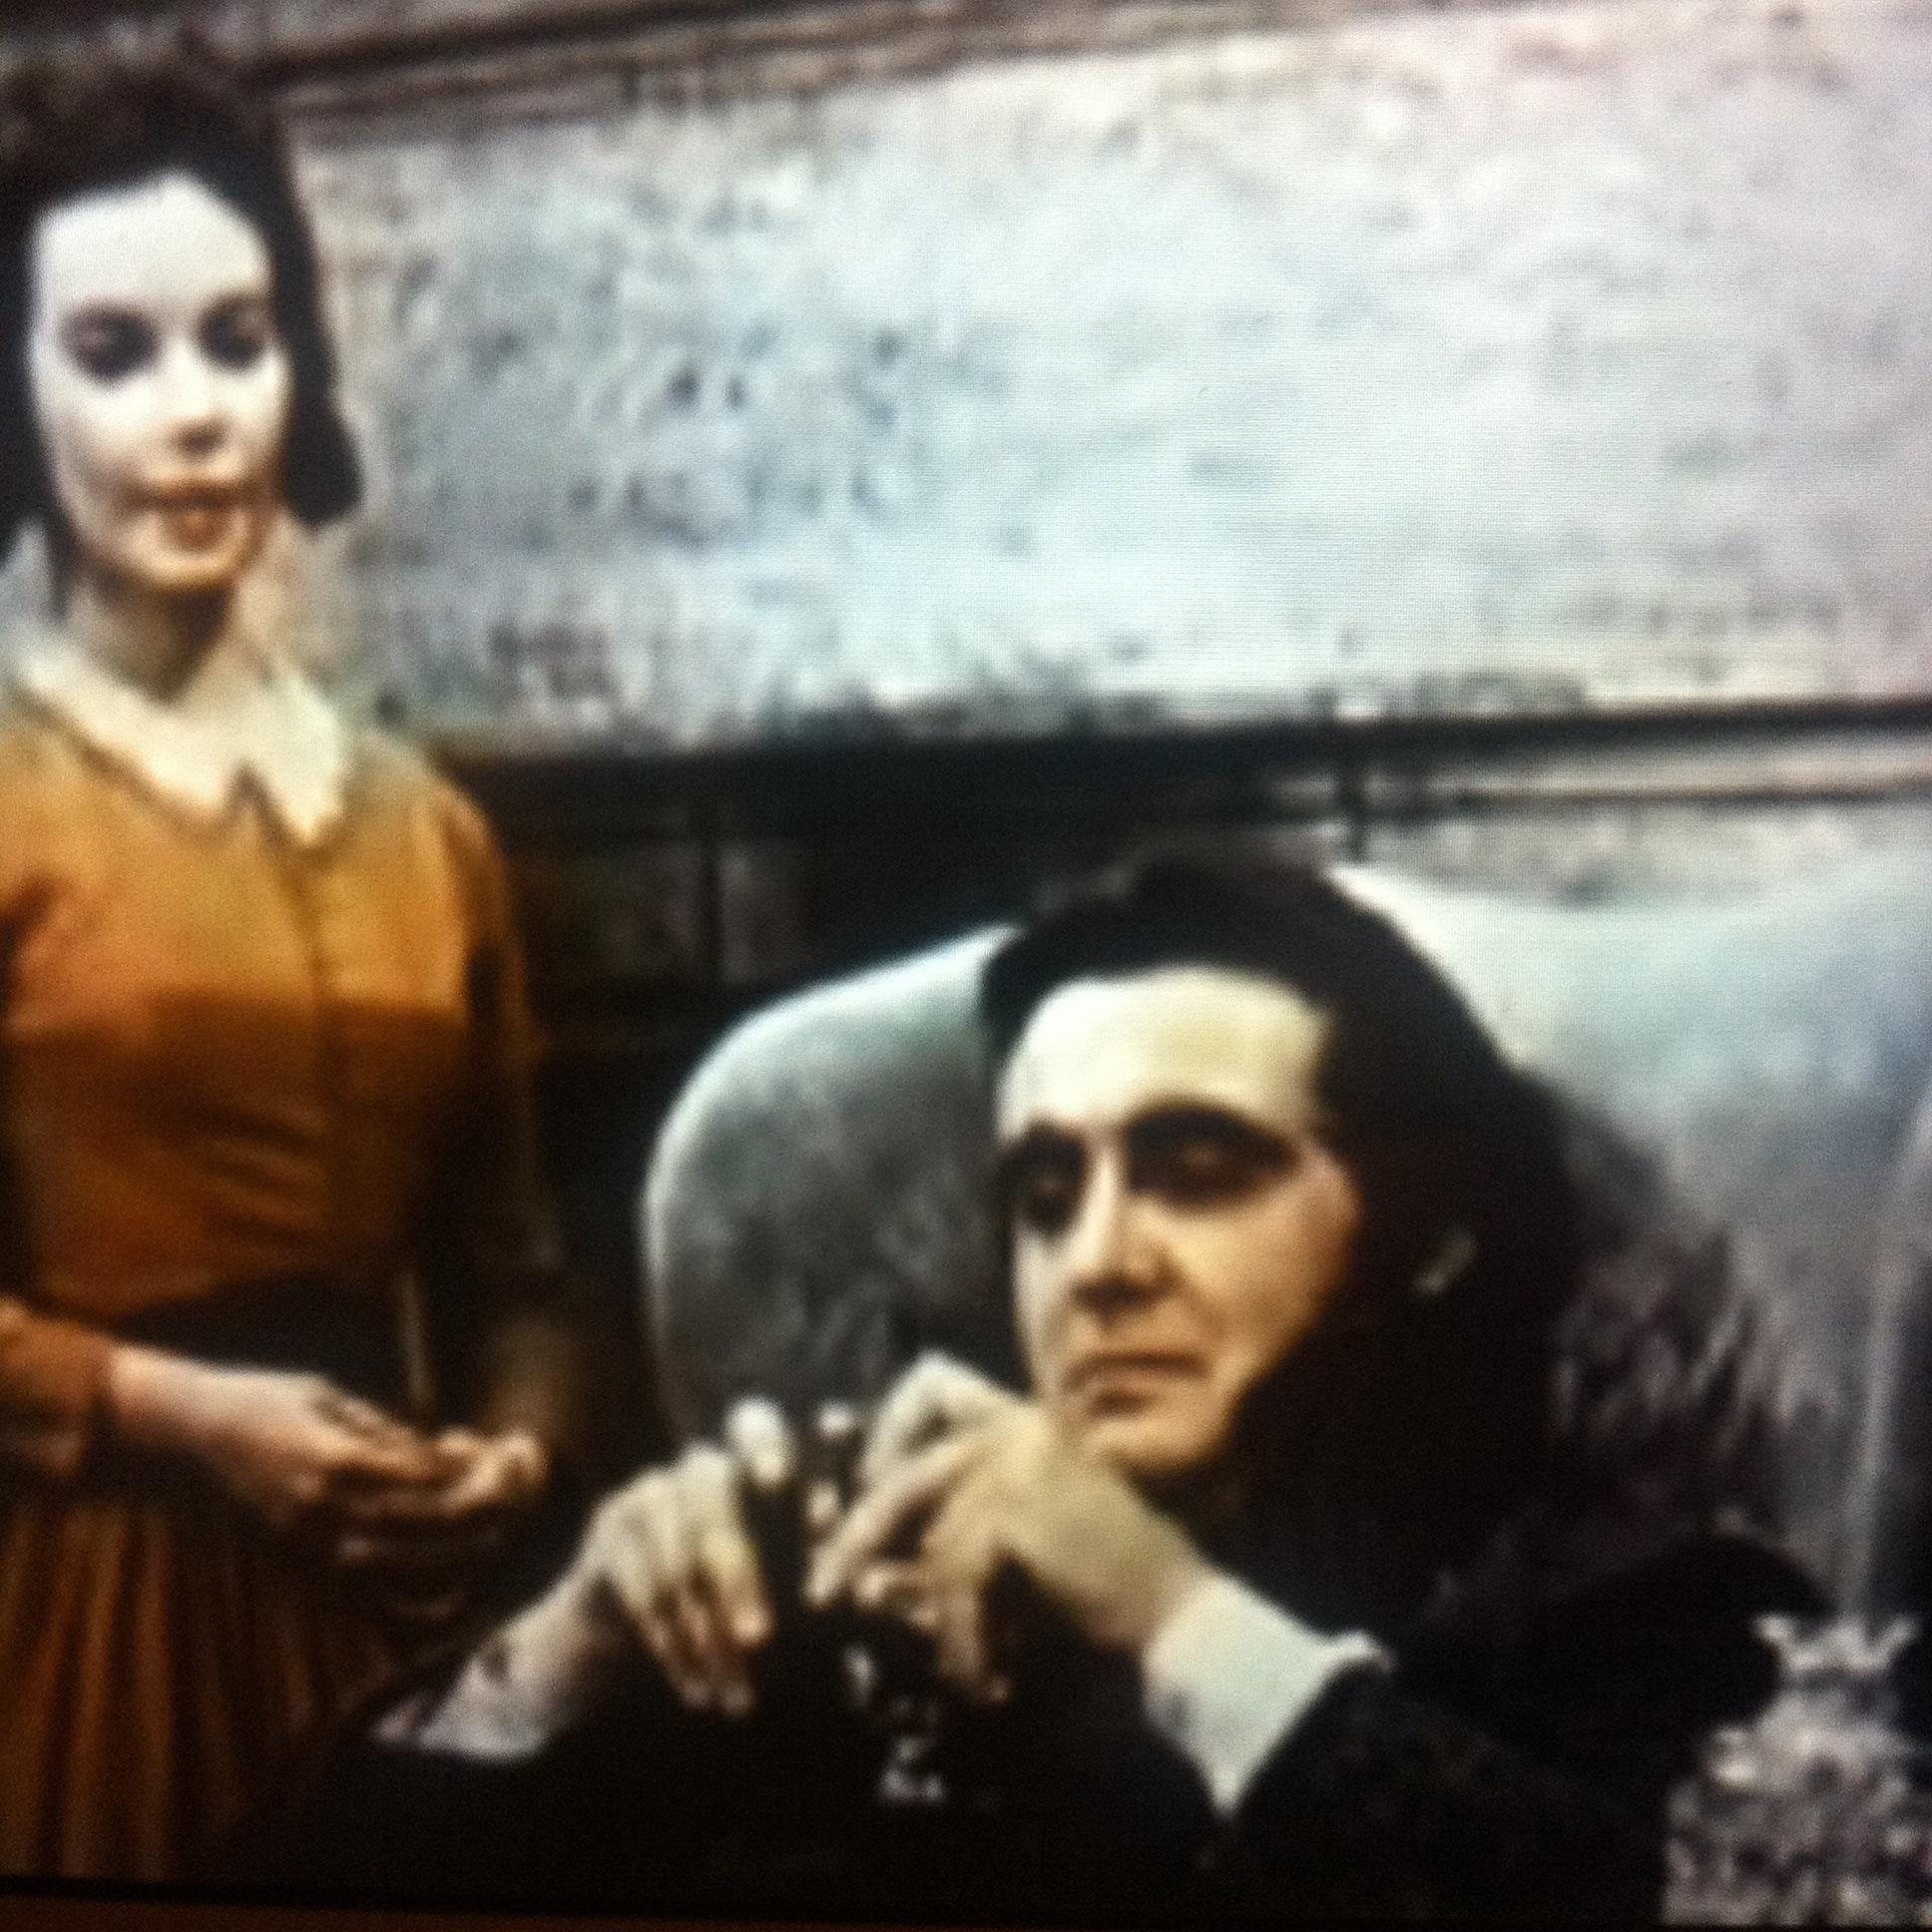 Patrick Macnee and Joan Elan in Matinee Theater (1955)